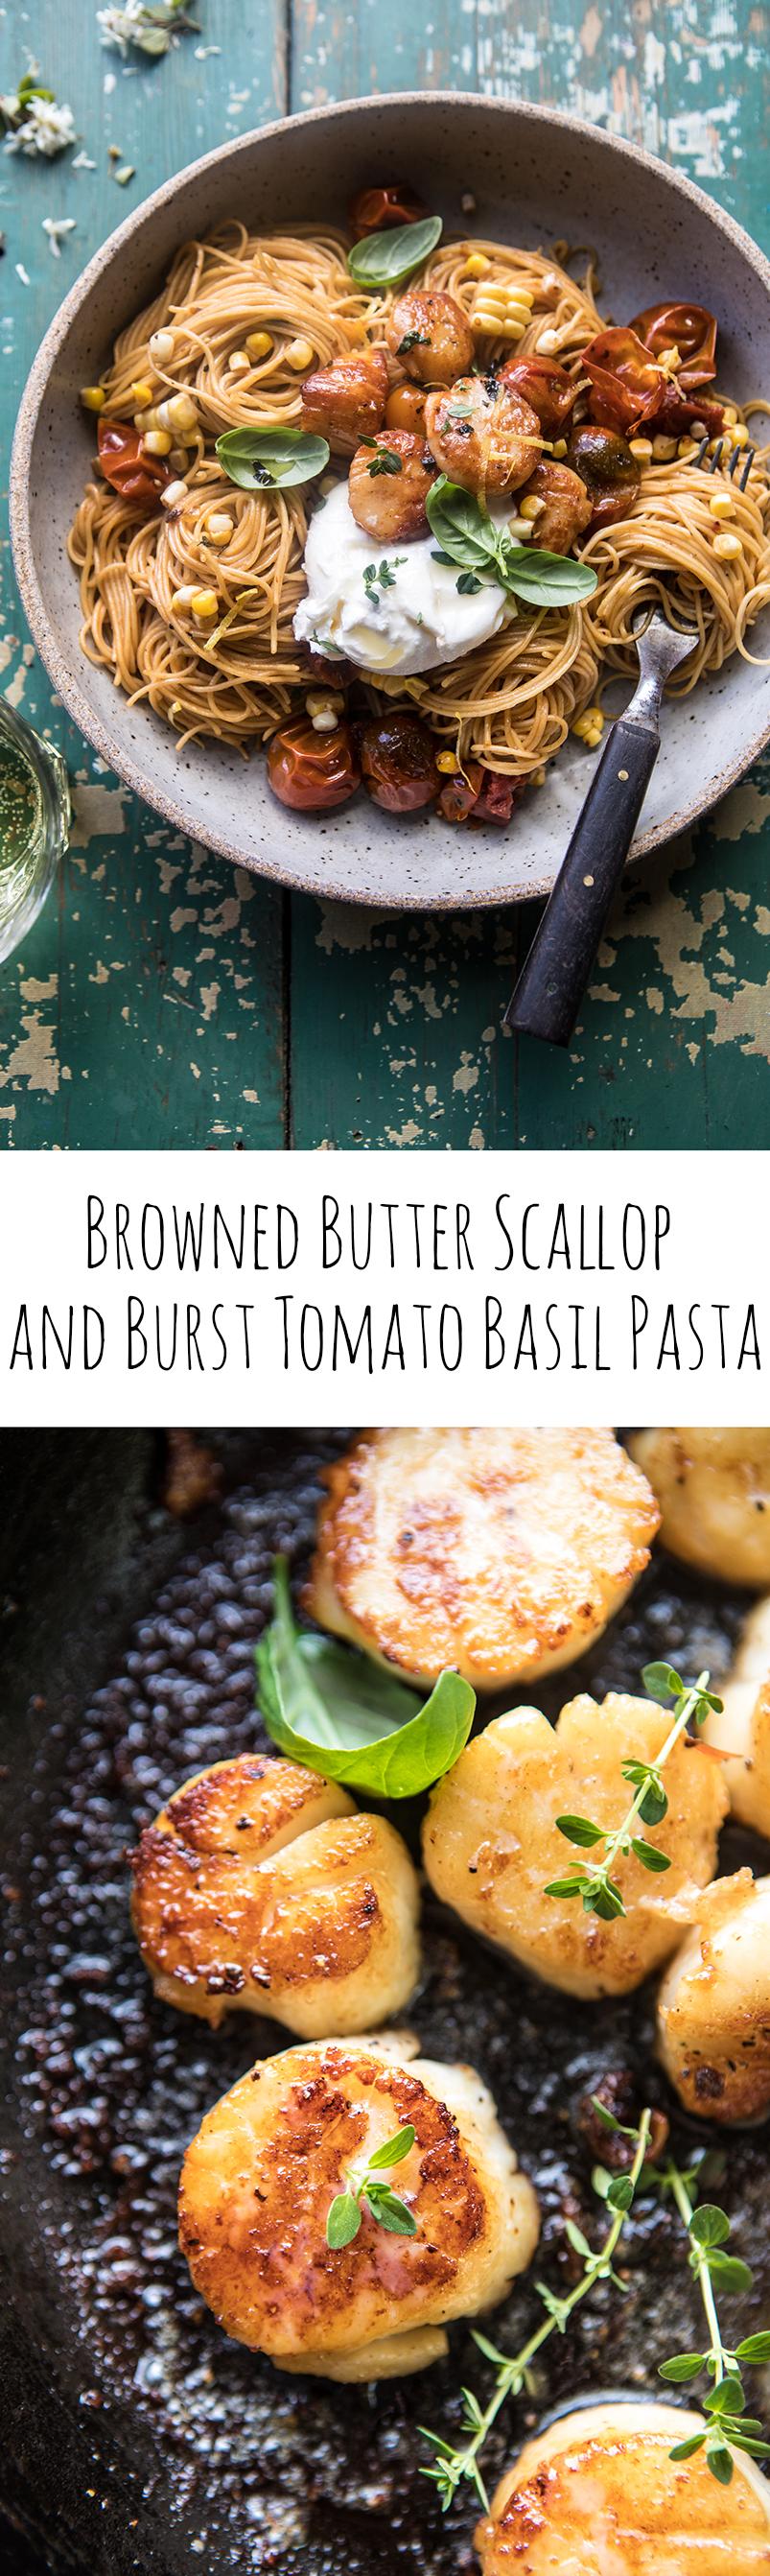 Browned Butter Scallop and Burst Tomato Basil Pasta   halfbakedharvest.com @hbharvest